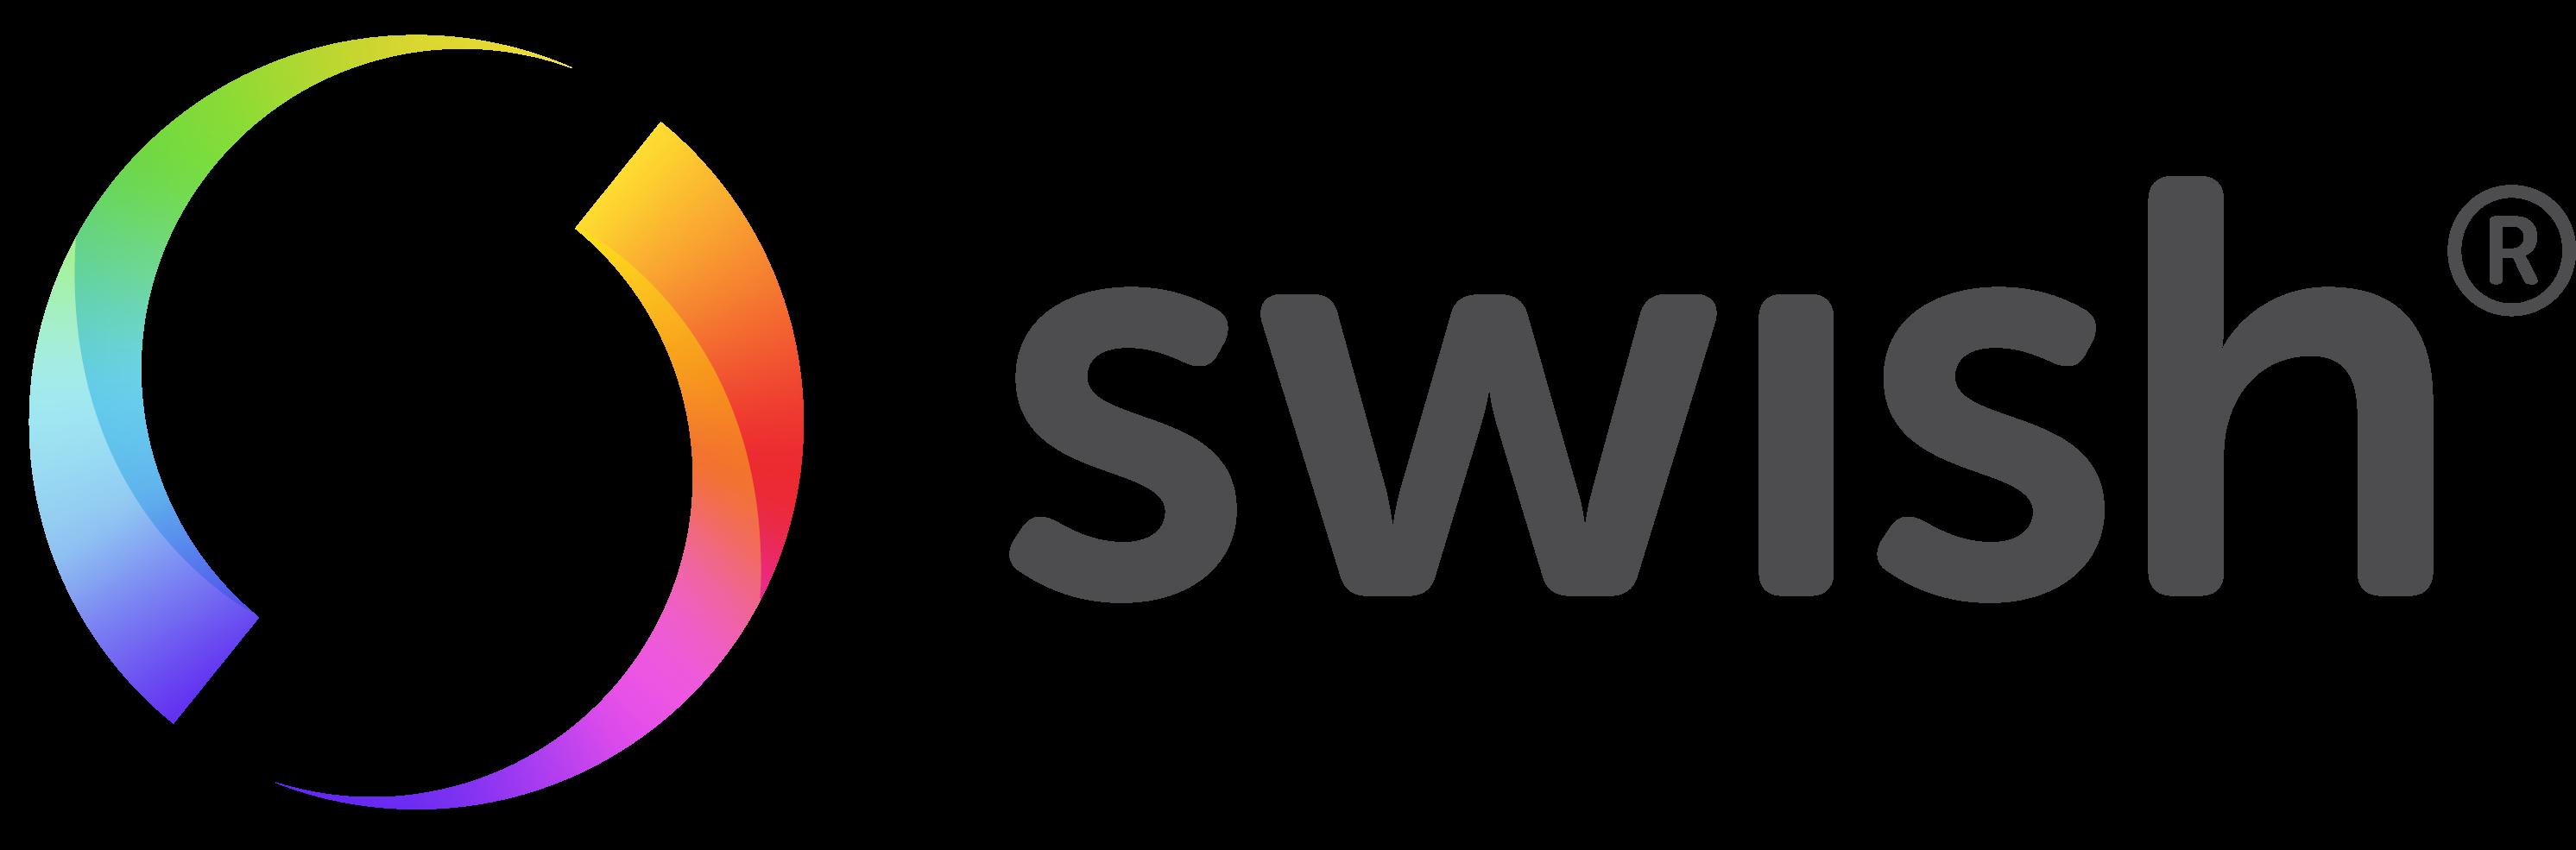 swish-logo-utan-bakgrund